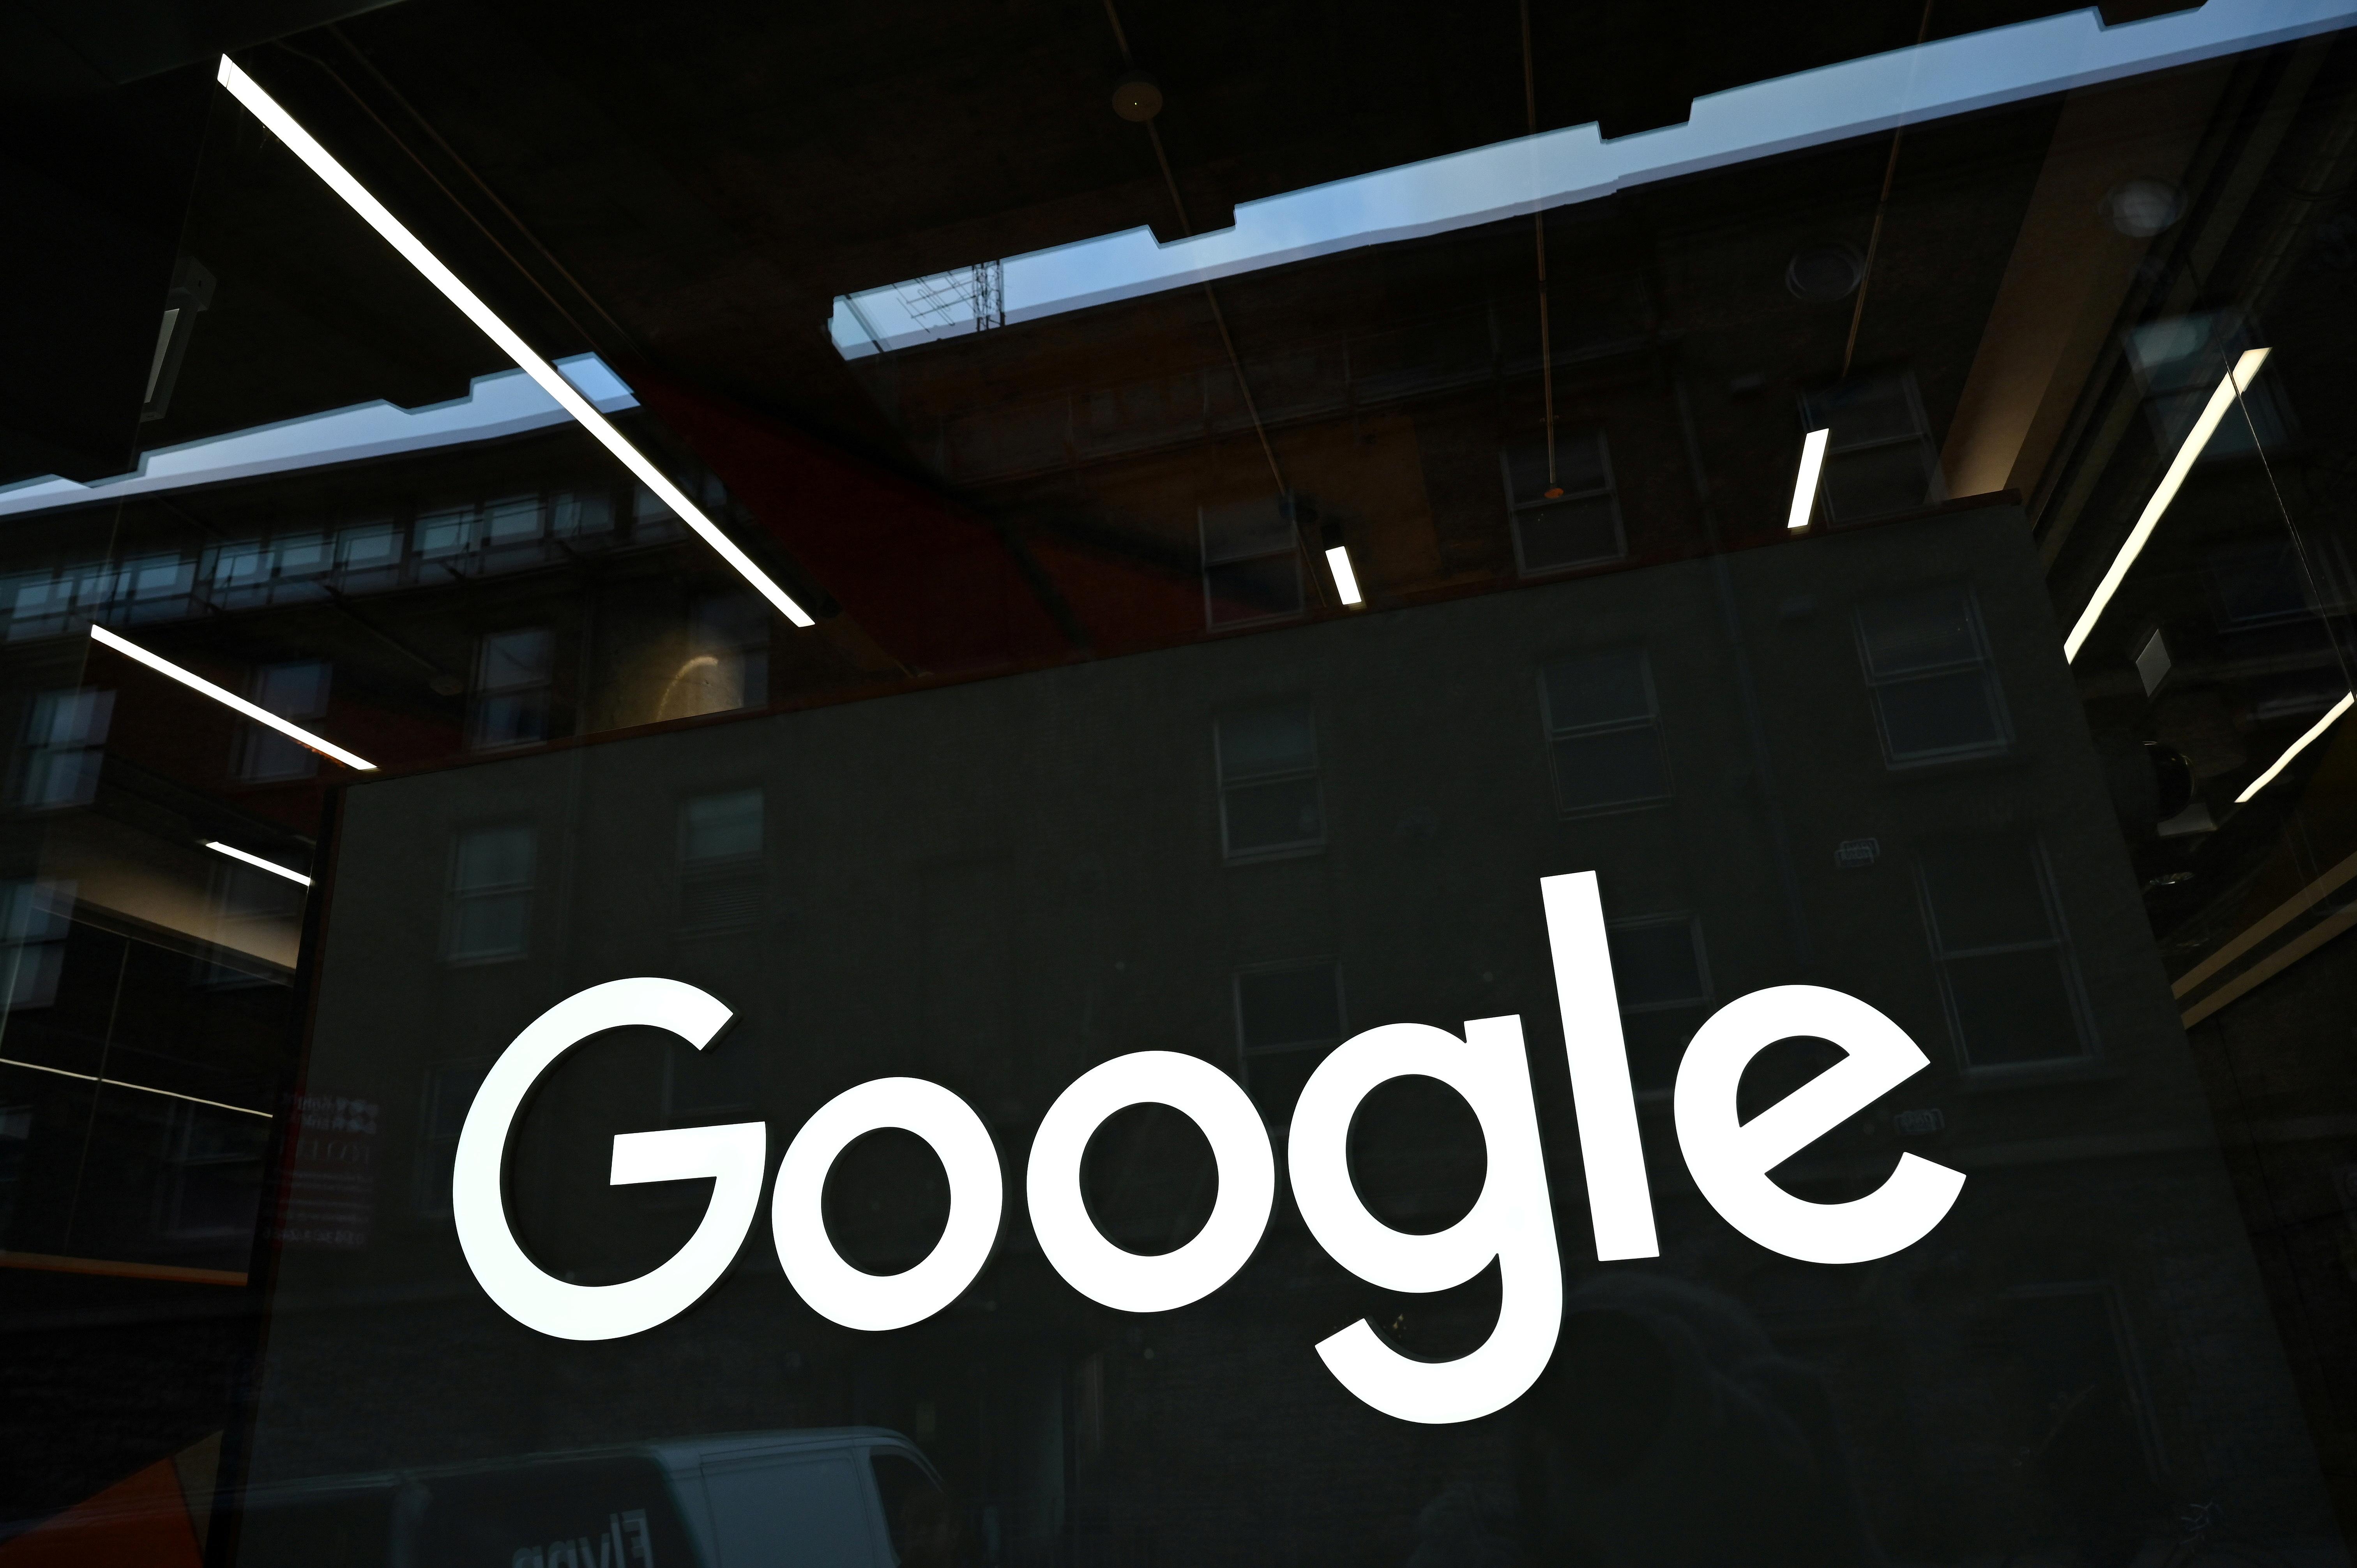 The Google logo is seen on on the company's European headquarters in Dublin, Ireland, February 27, 2021. REUTERS/Clodagh Kilcoyne